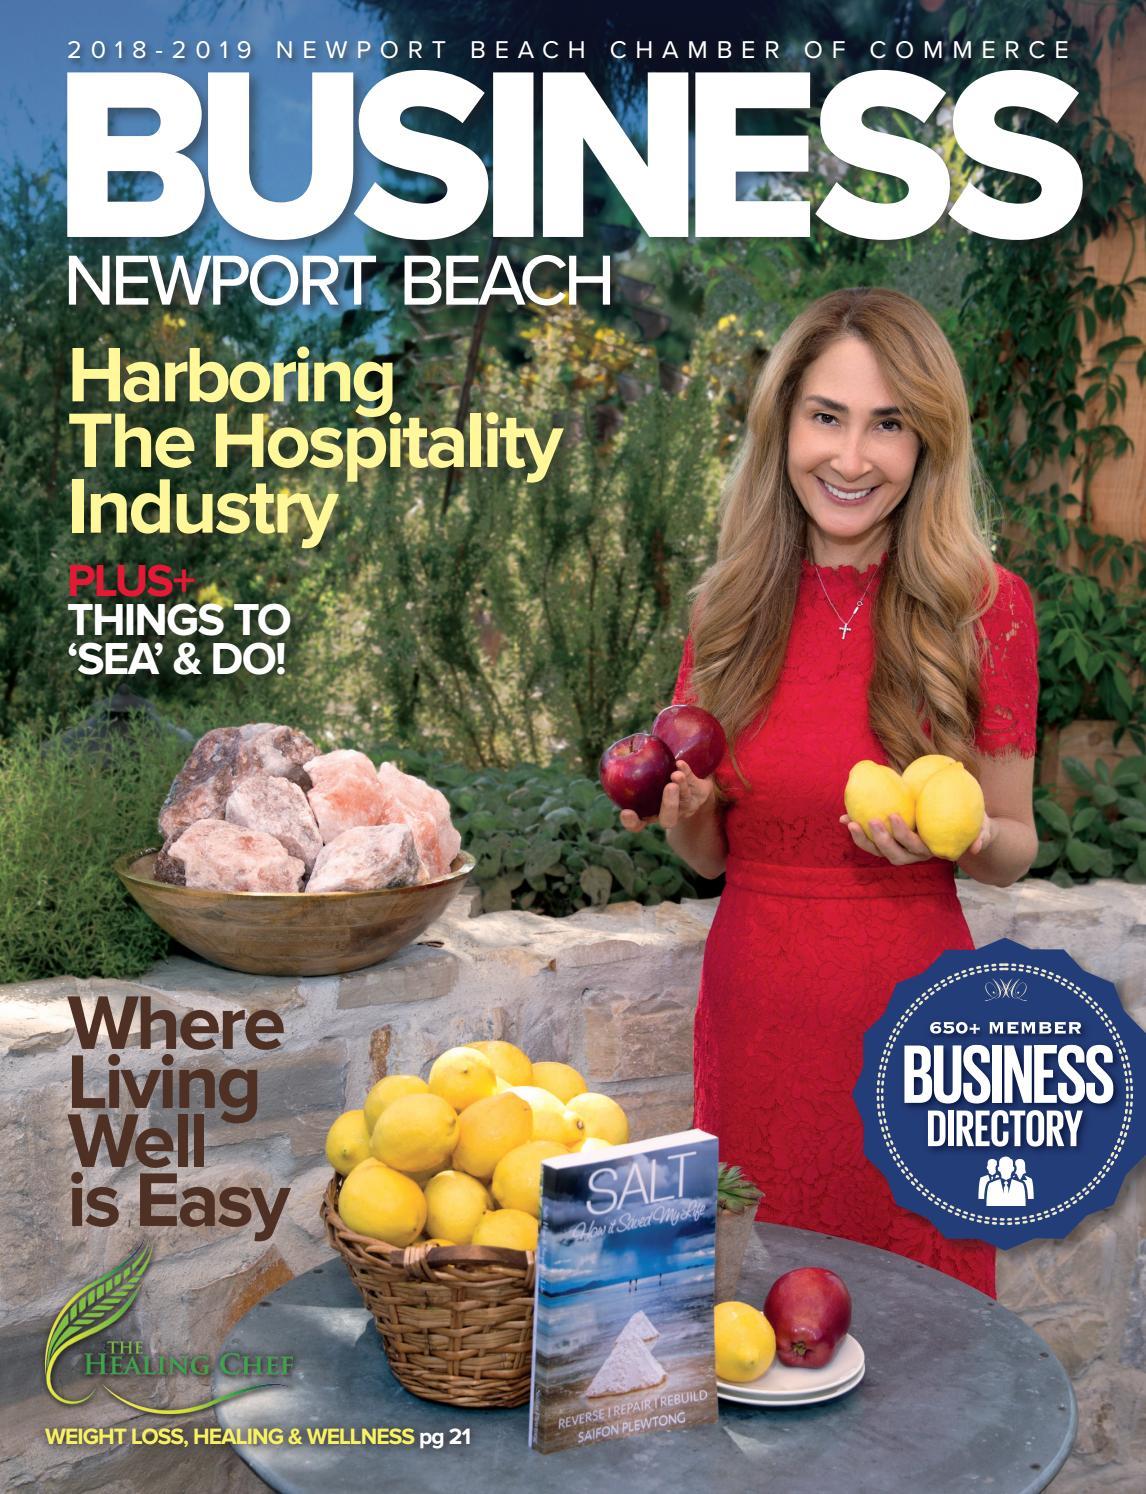 Business Newport Beach 2018-2019 by Chamber Marketing